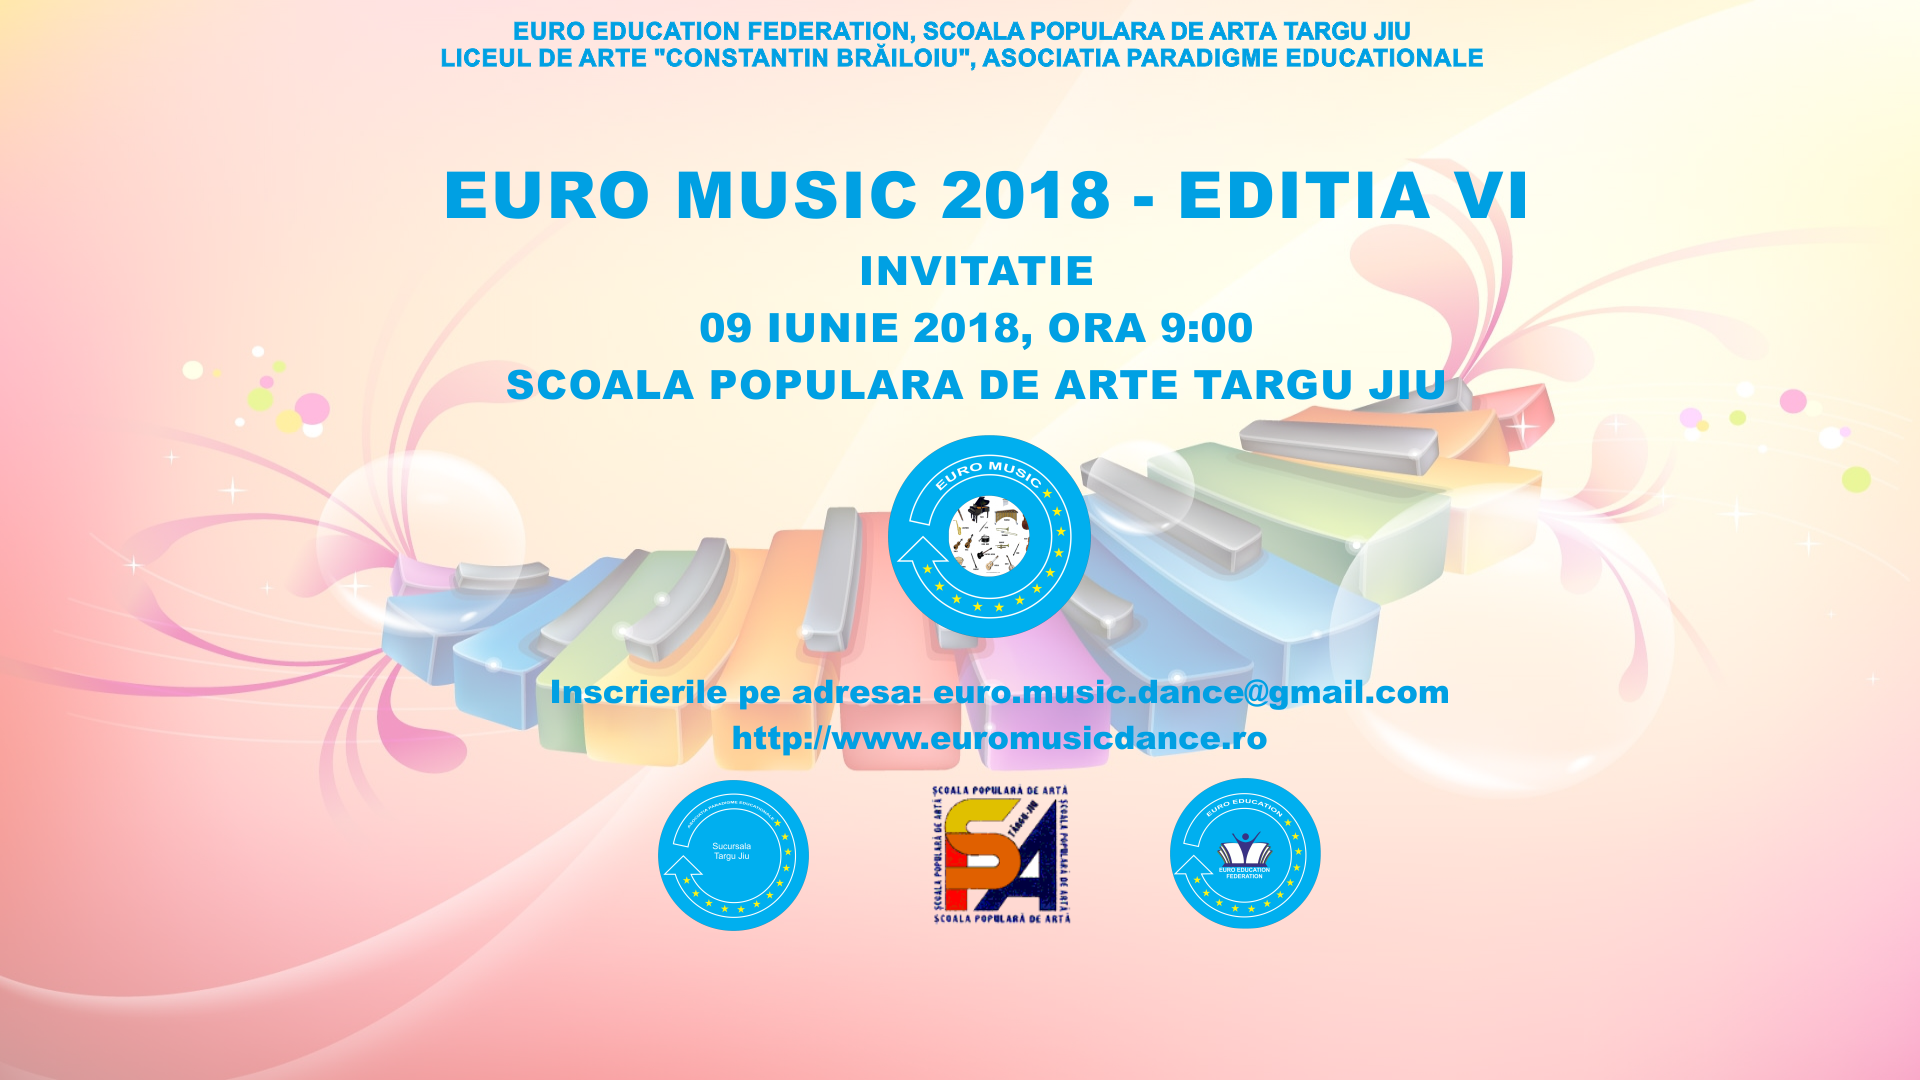 EURO MUSIC DANCE 2018